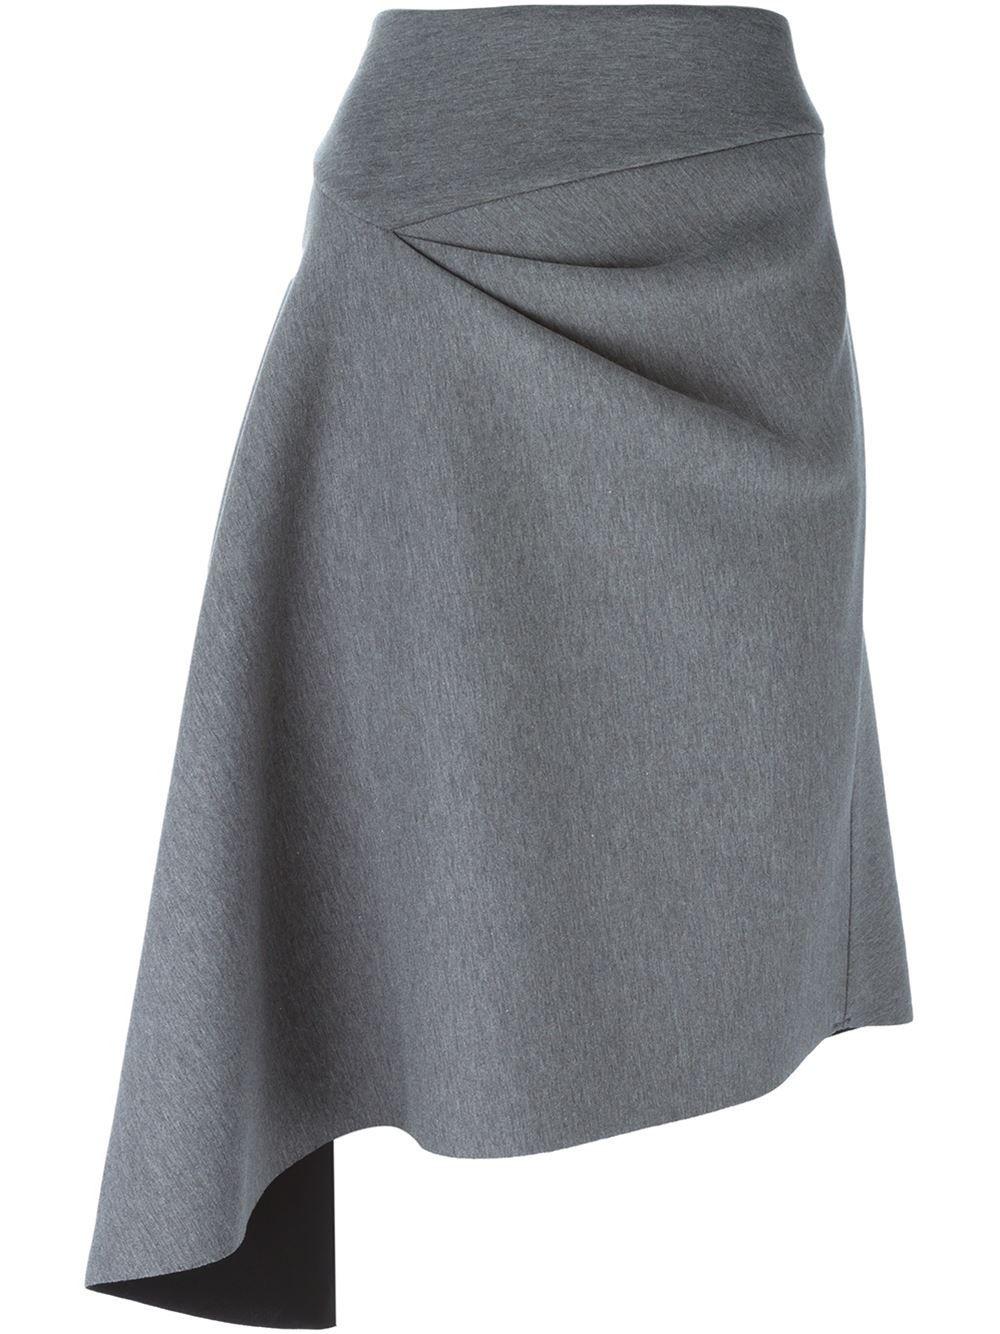 Dkny Asymmetric Skirt - Voo Store - Farfetch.com More